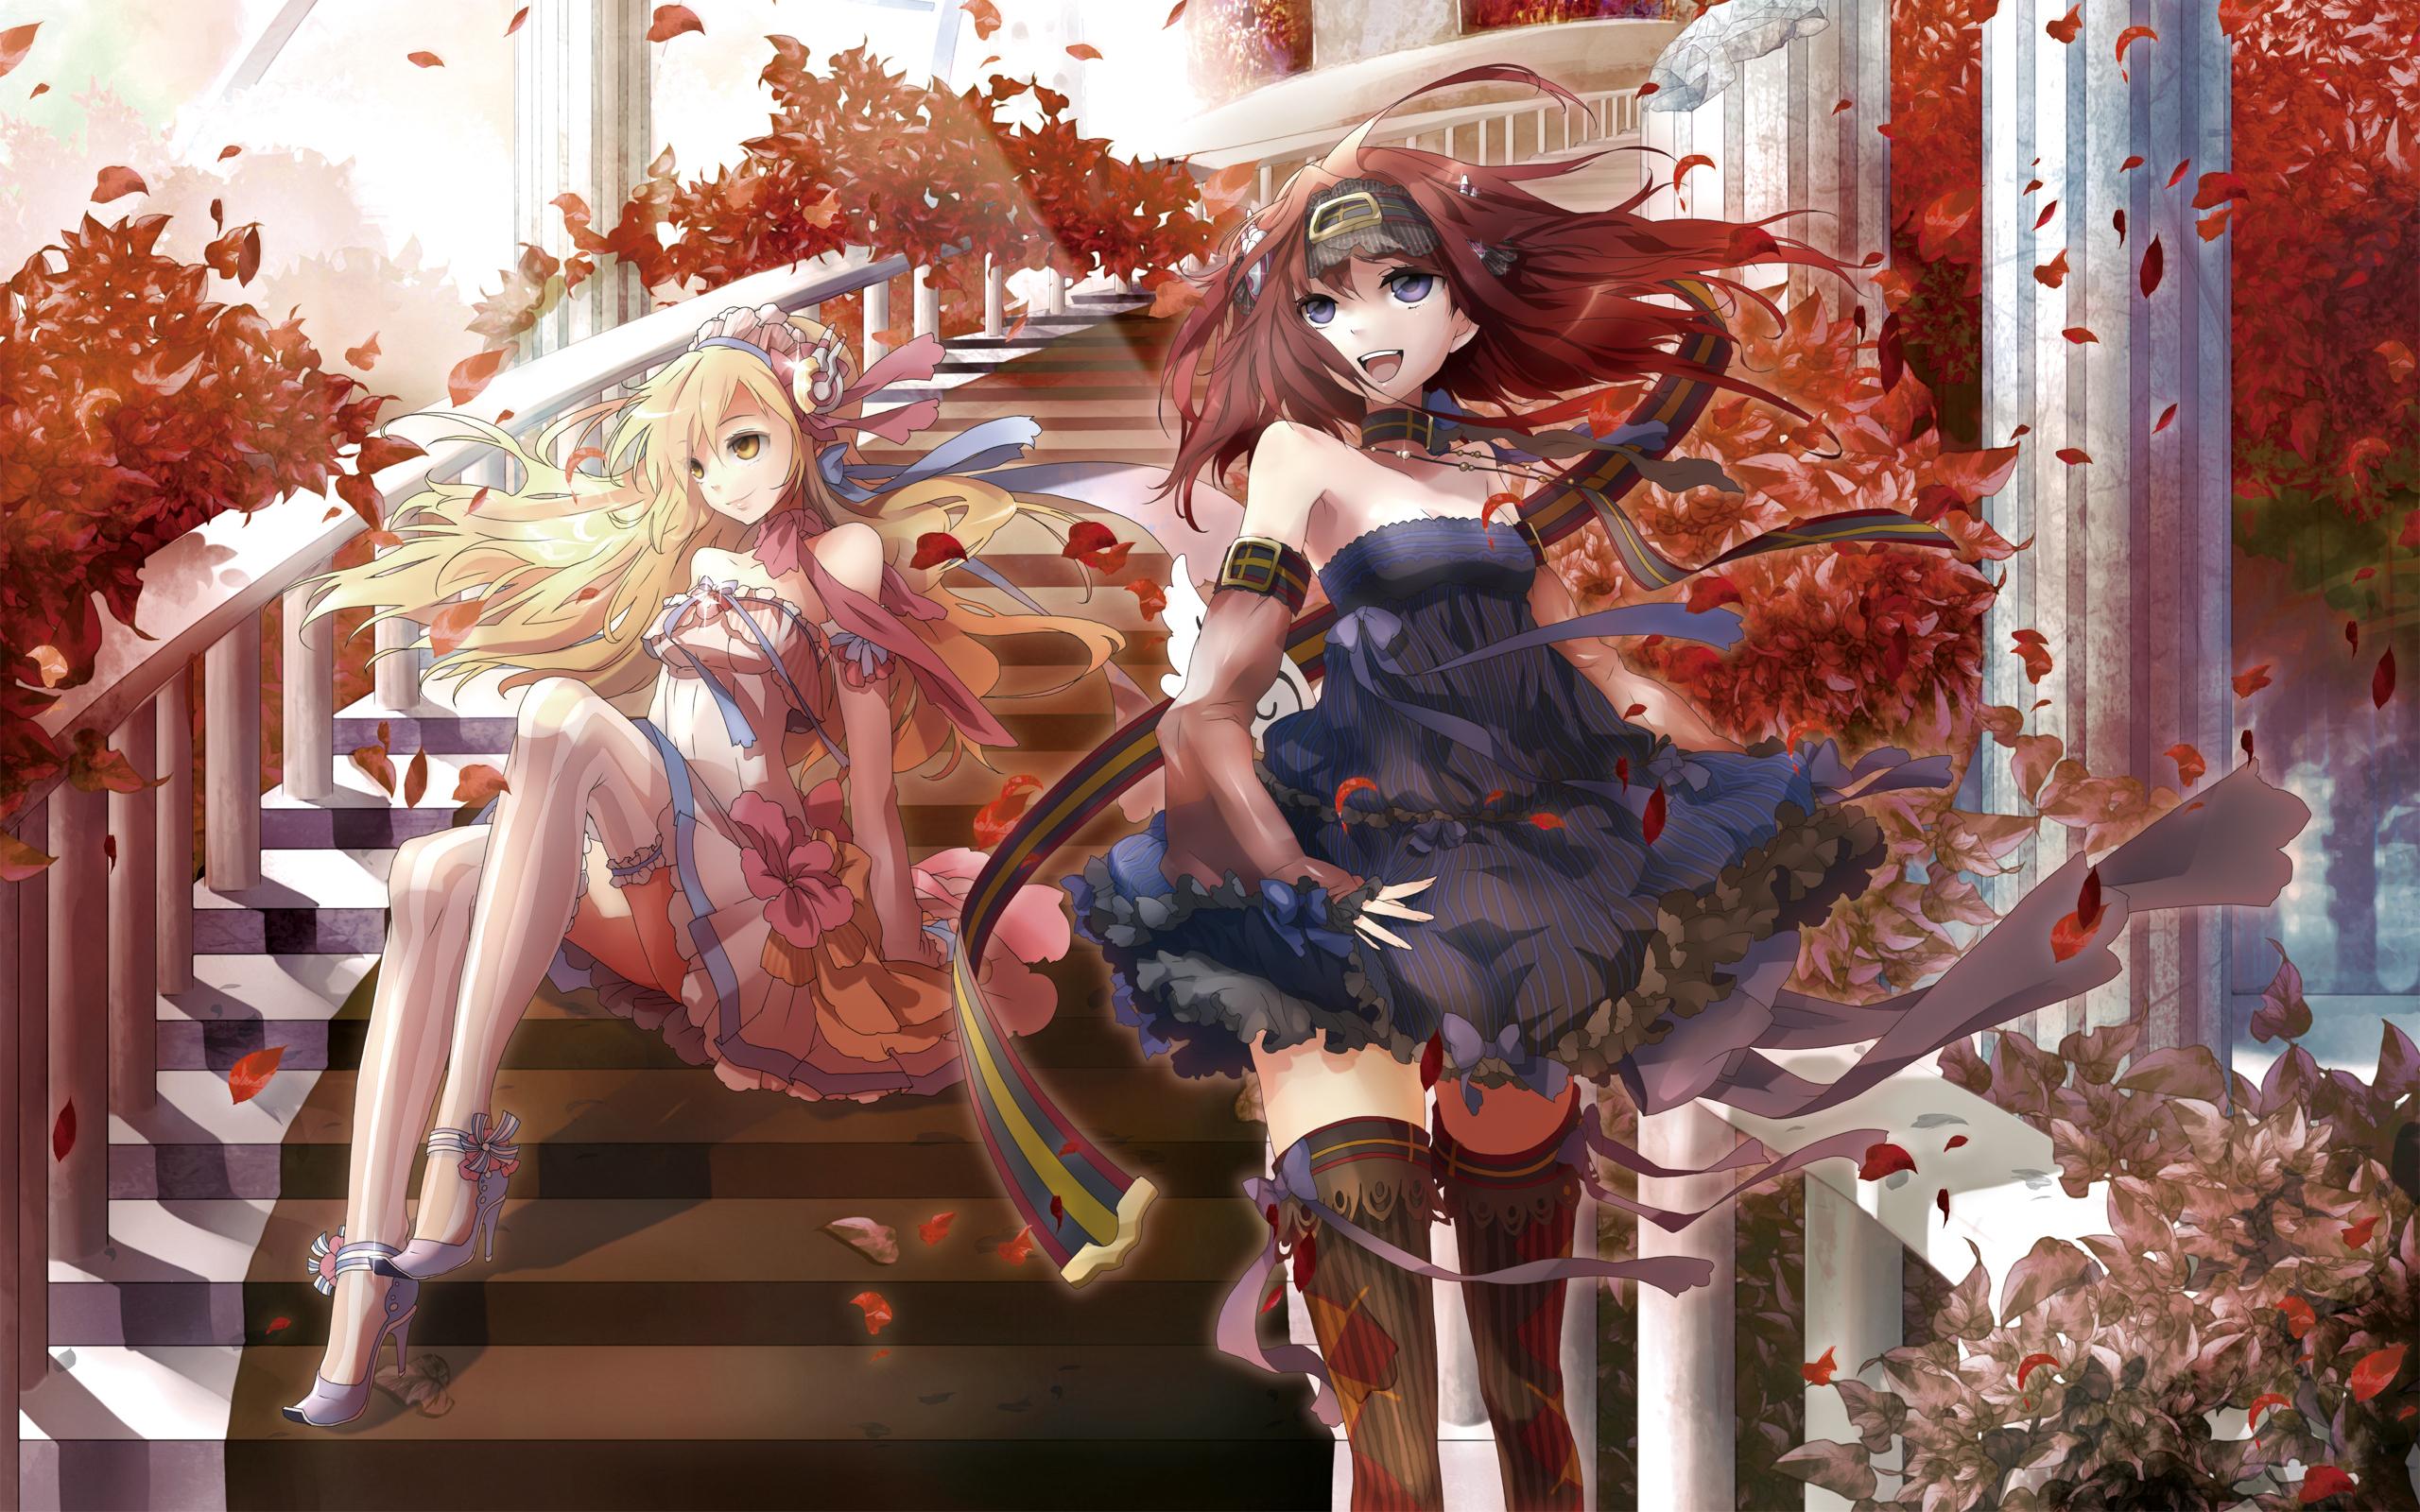 Kitsune Girl Hd Wallpaper Girl Hd Wallpaper Background Image 2560x1600 Id